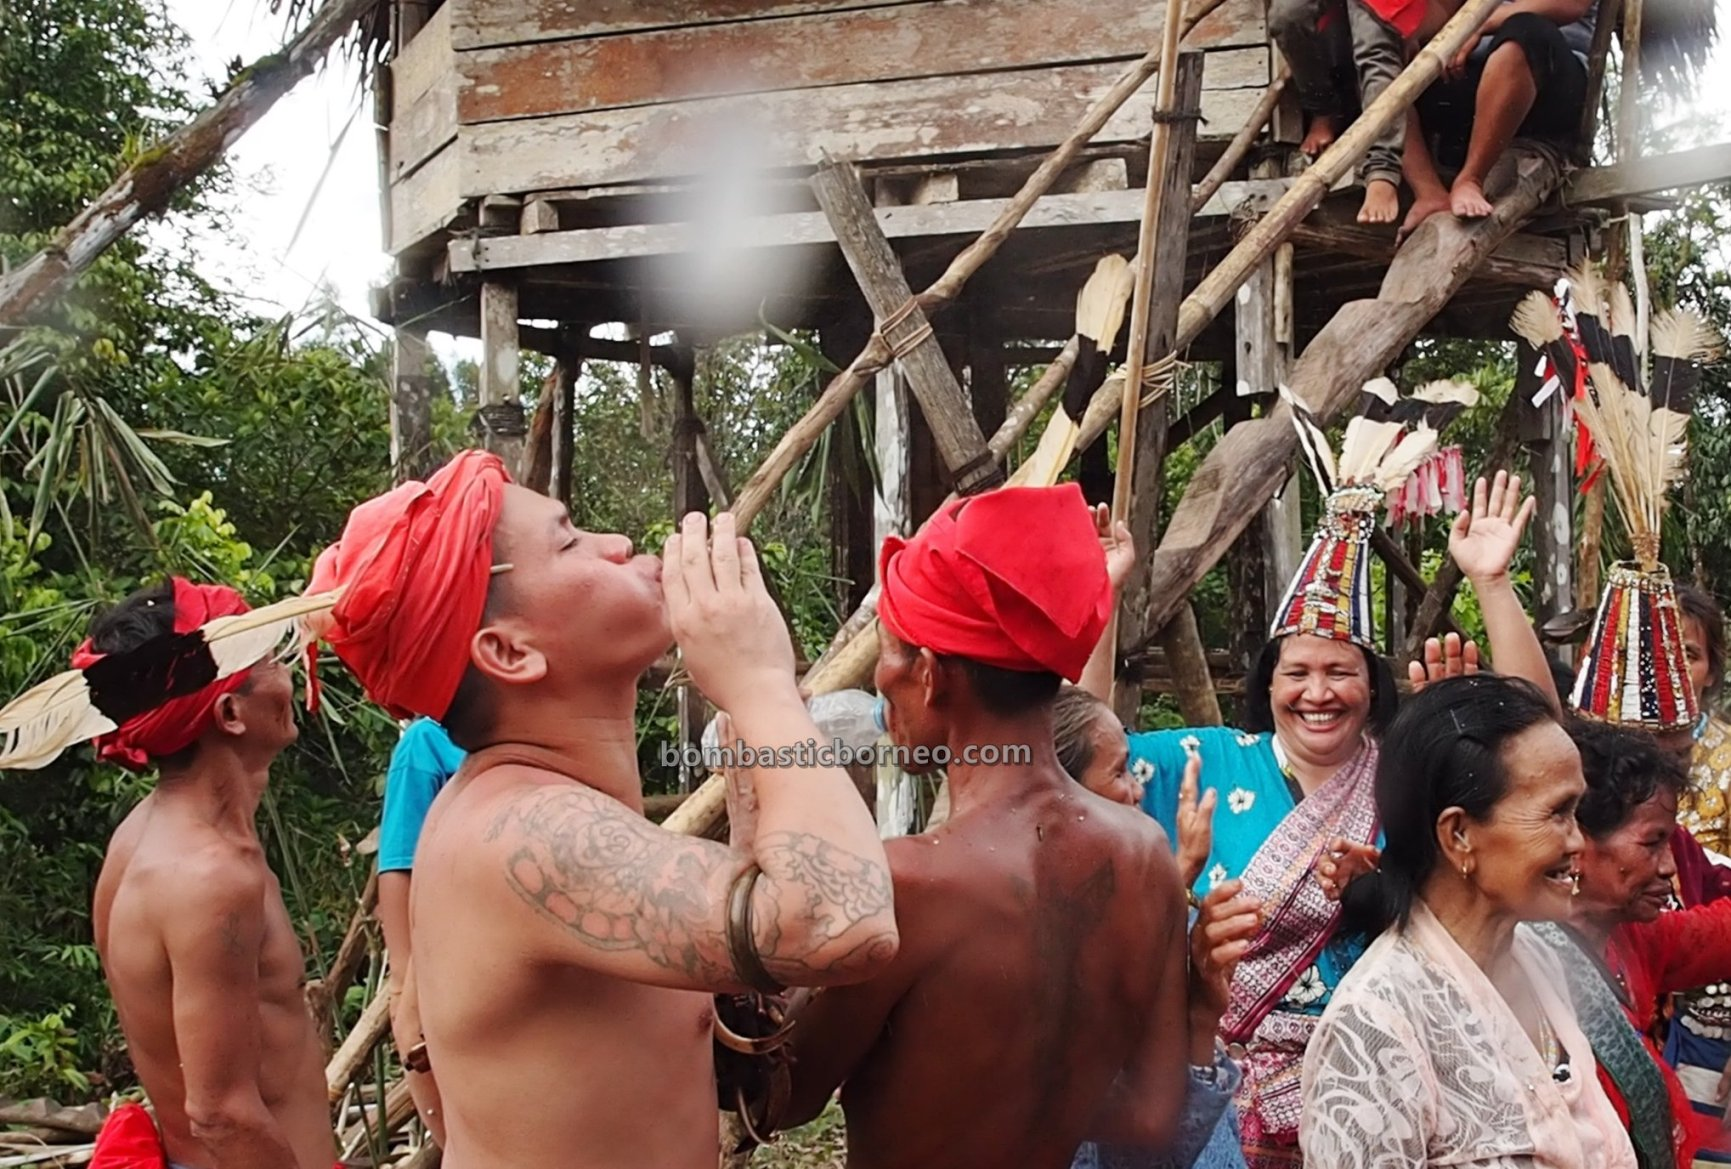 Gawai Padi, Paddy Harvest Festival, traditional, Indonesia, budaya, Desa Bengkawan, Dayak Kowon't, Ethnic, native, Tourism, tourist attraction, Travel guide, Trans Borneo, 穿越婆罗洲游踪, 西加里曼丹达雅部落, 印尼孟加映原住民